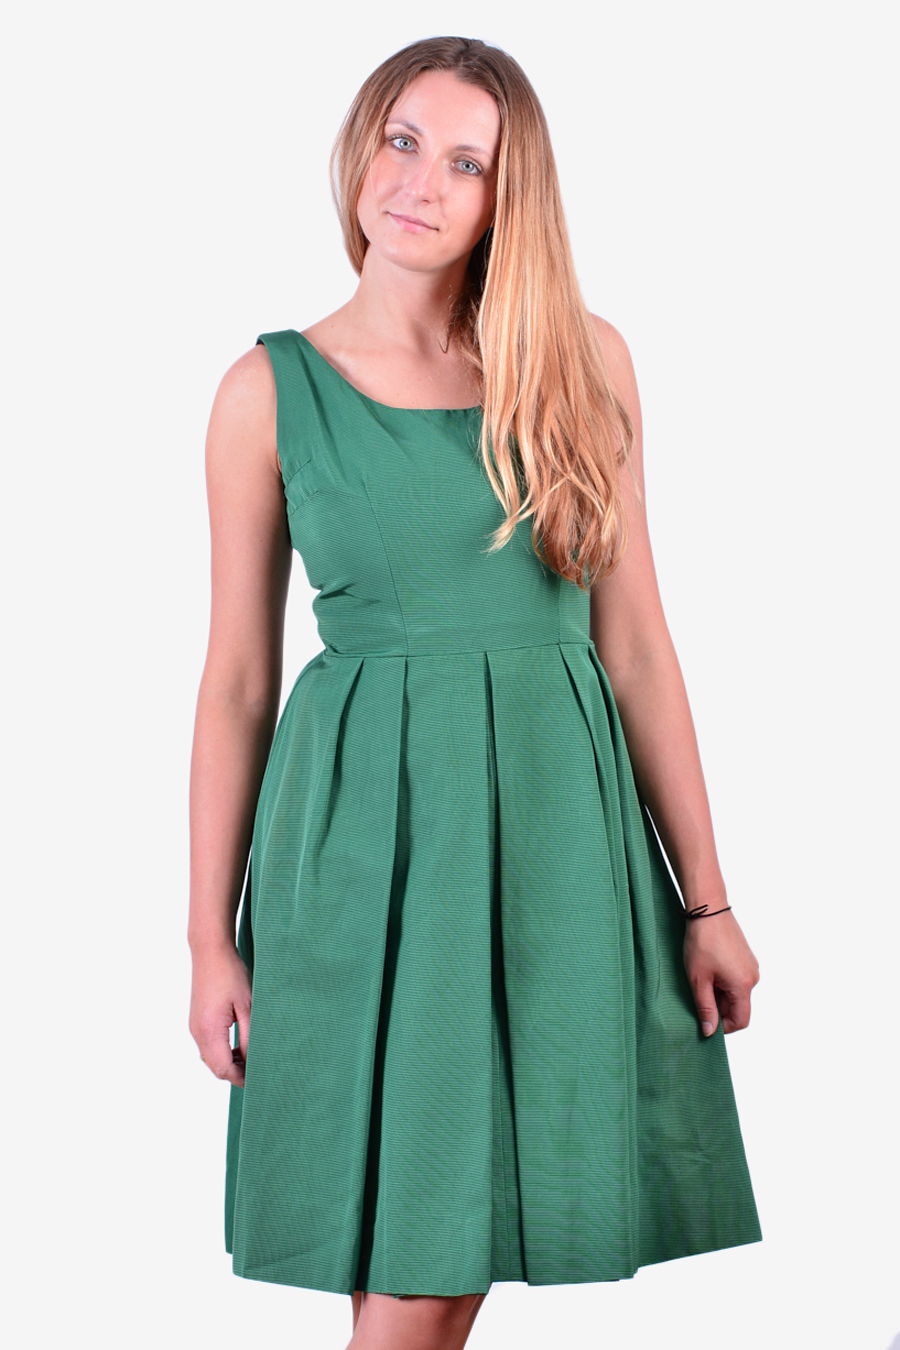 Vintage 1950's green day dress